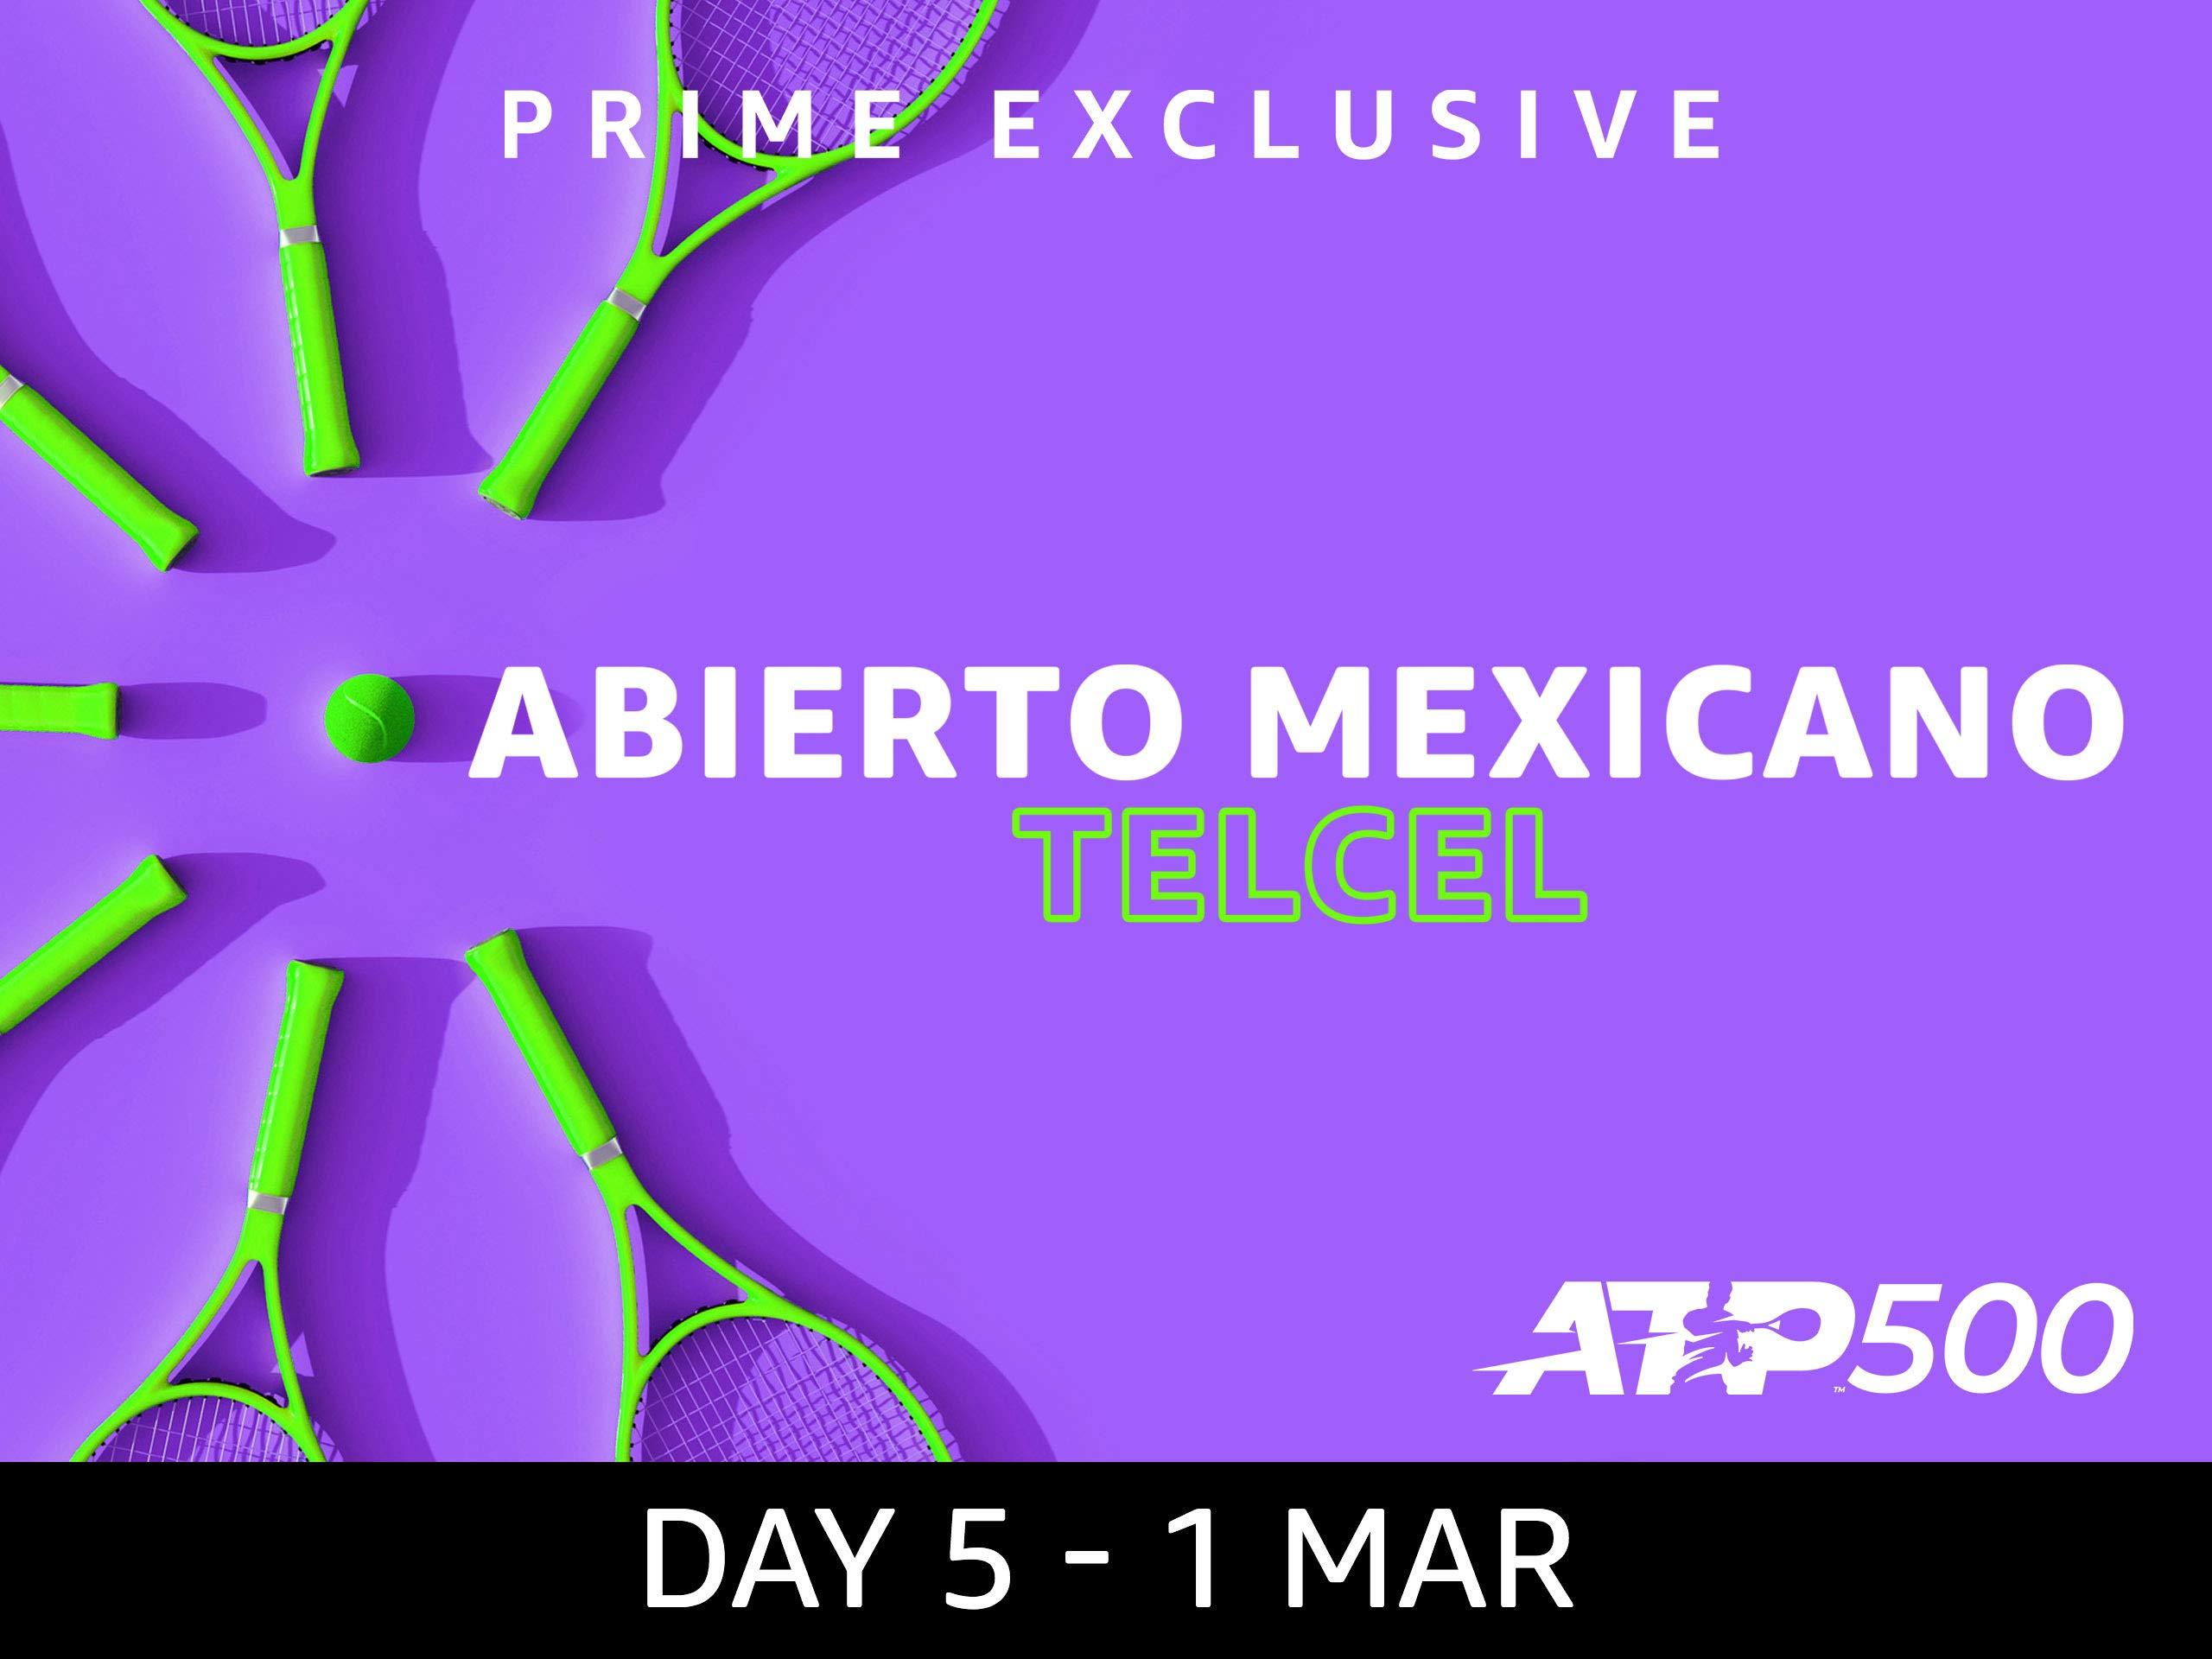 2019 Abierto Mexicano Telcel presentado por HSBC, ATP 500 - Day 5 on Amazon Prime Video UK